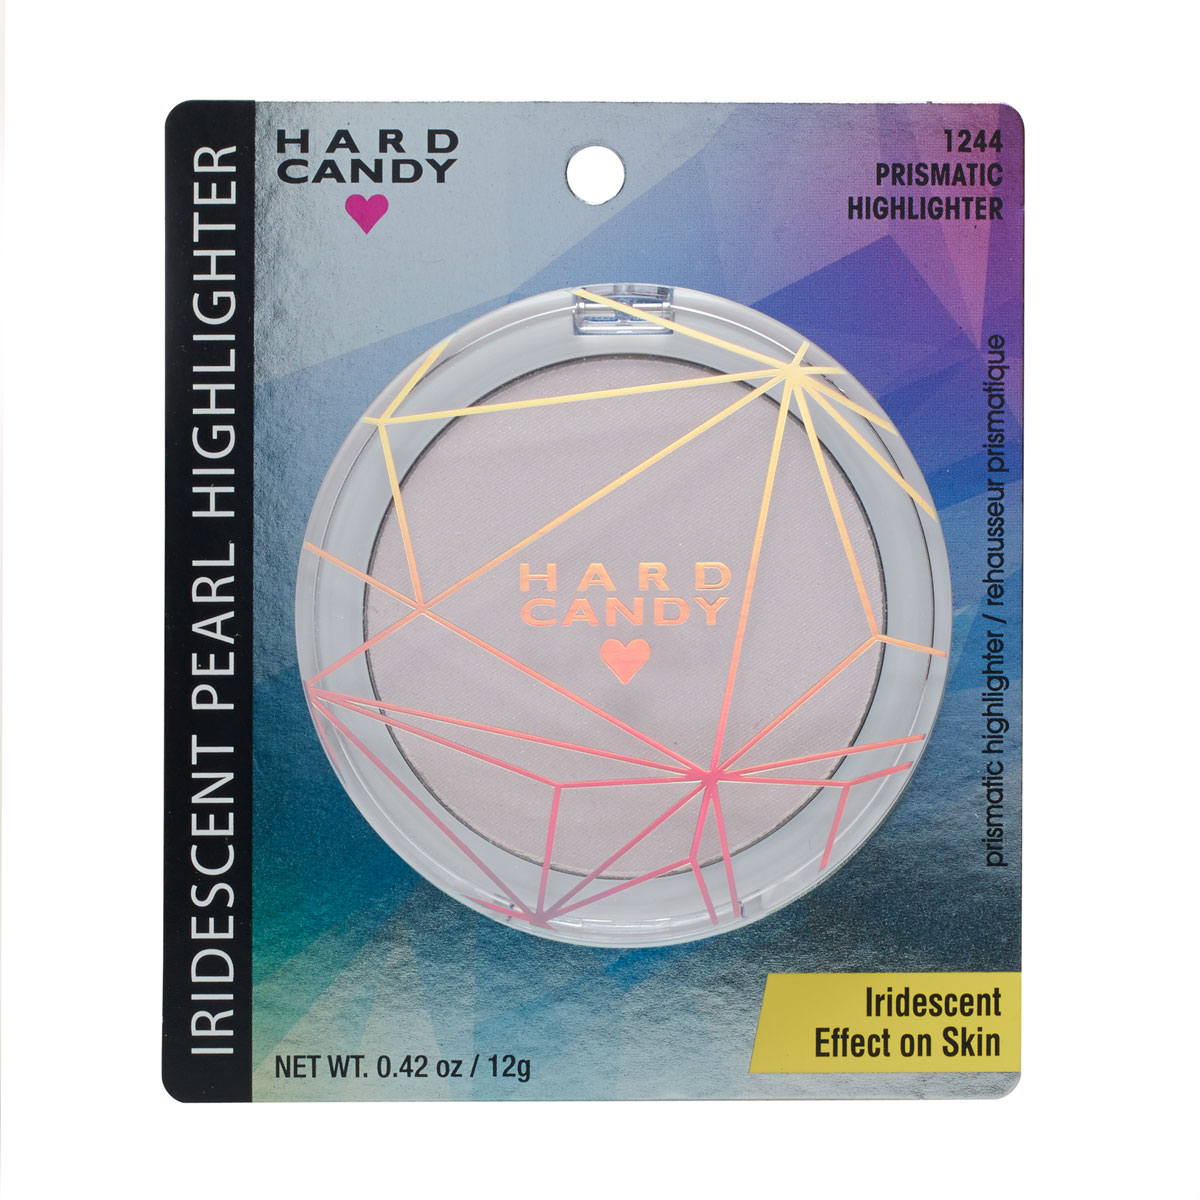 Hard Candy Sheer Envy Prismatic Highlighter